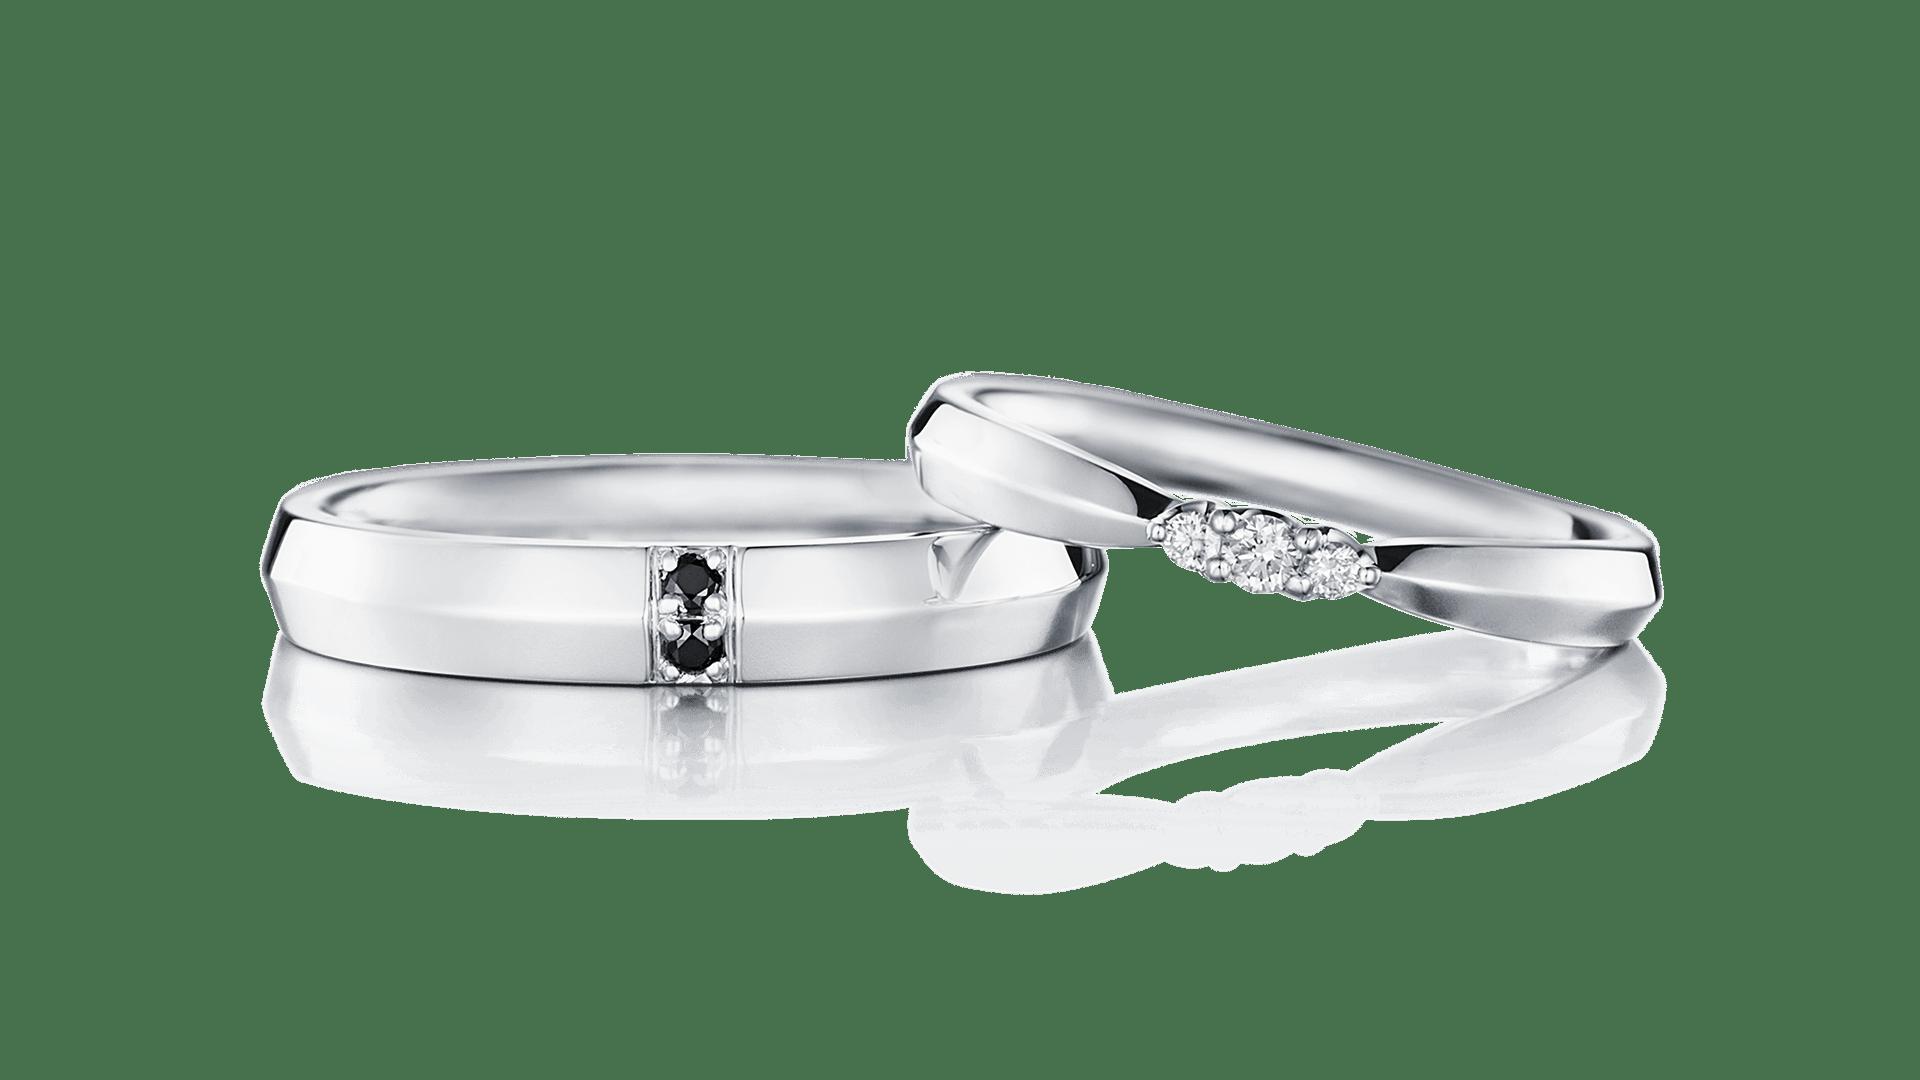 saulia サウリア | 結婚指輪サムネイル 1